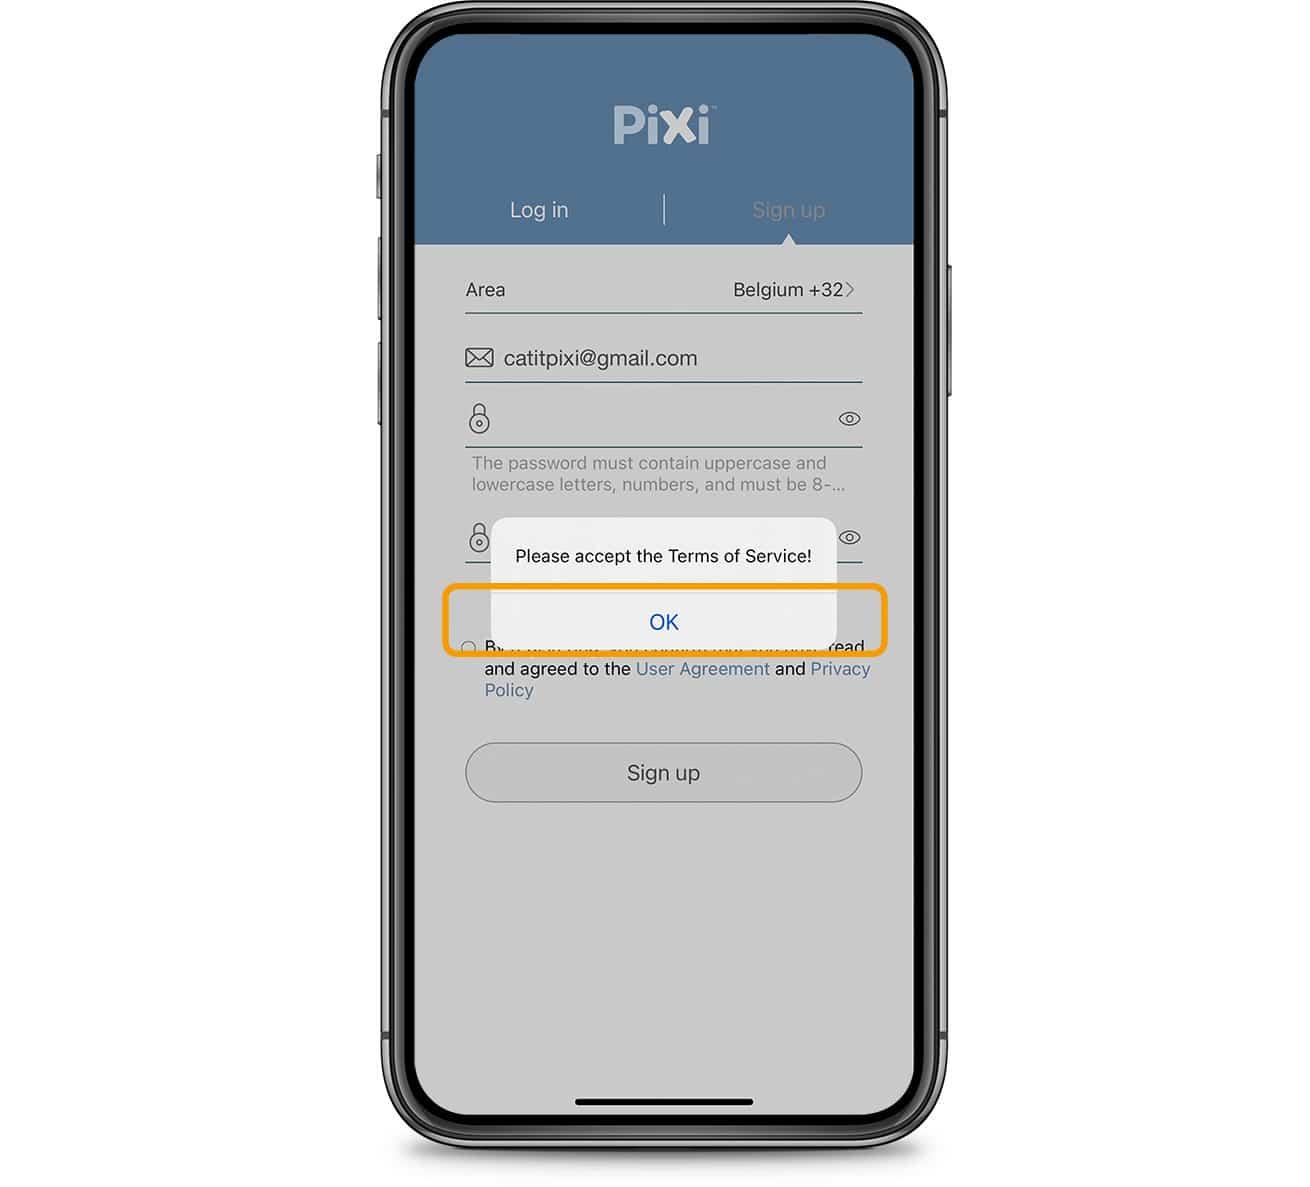 PIXI App terms of service